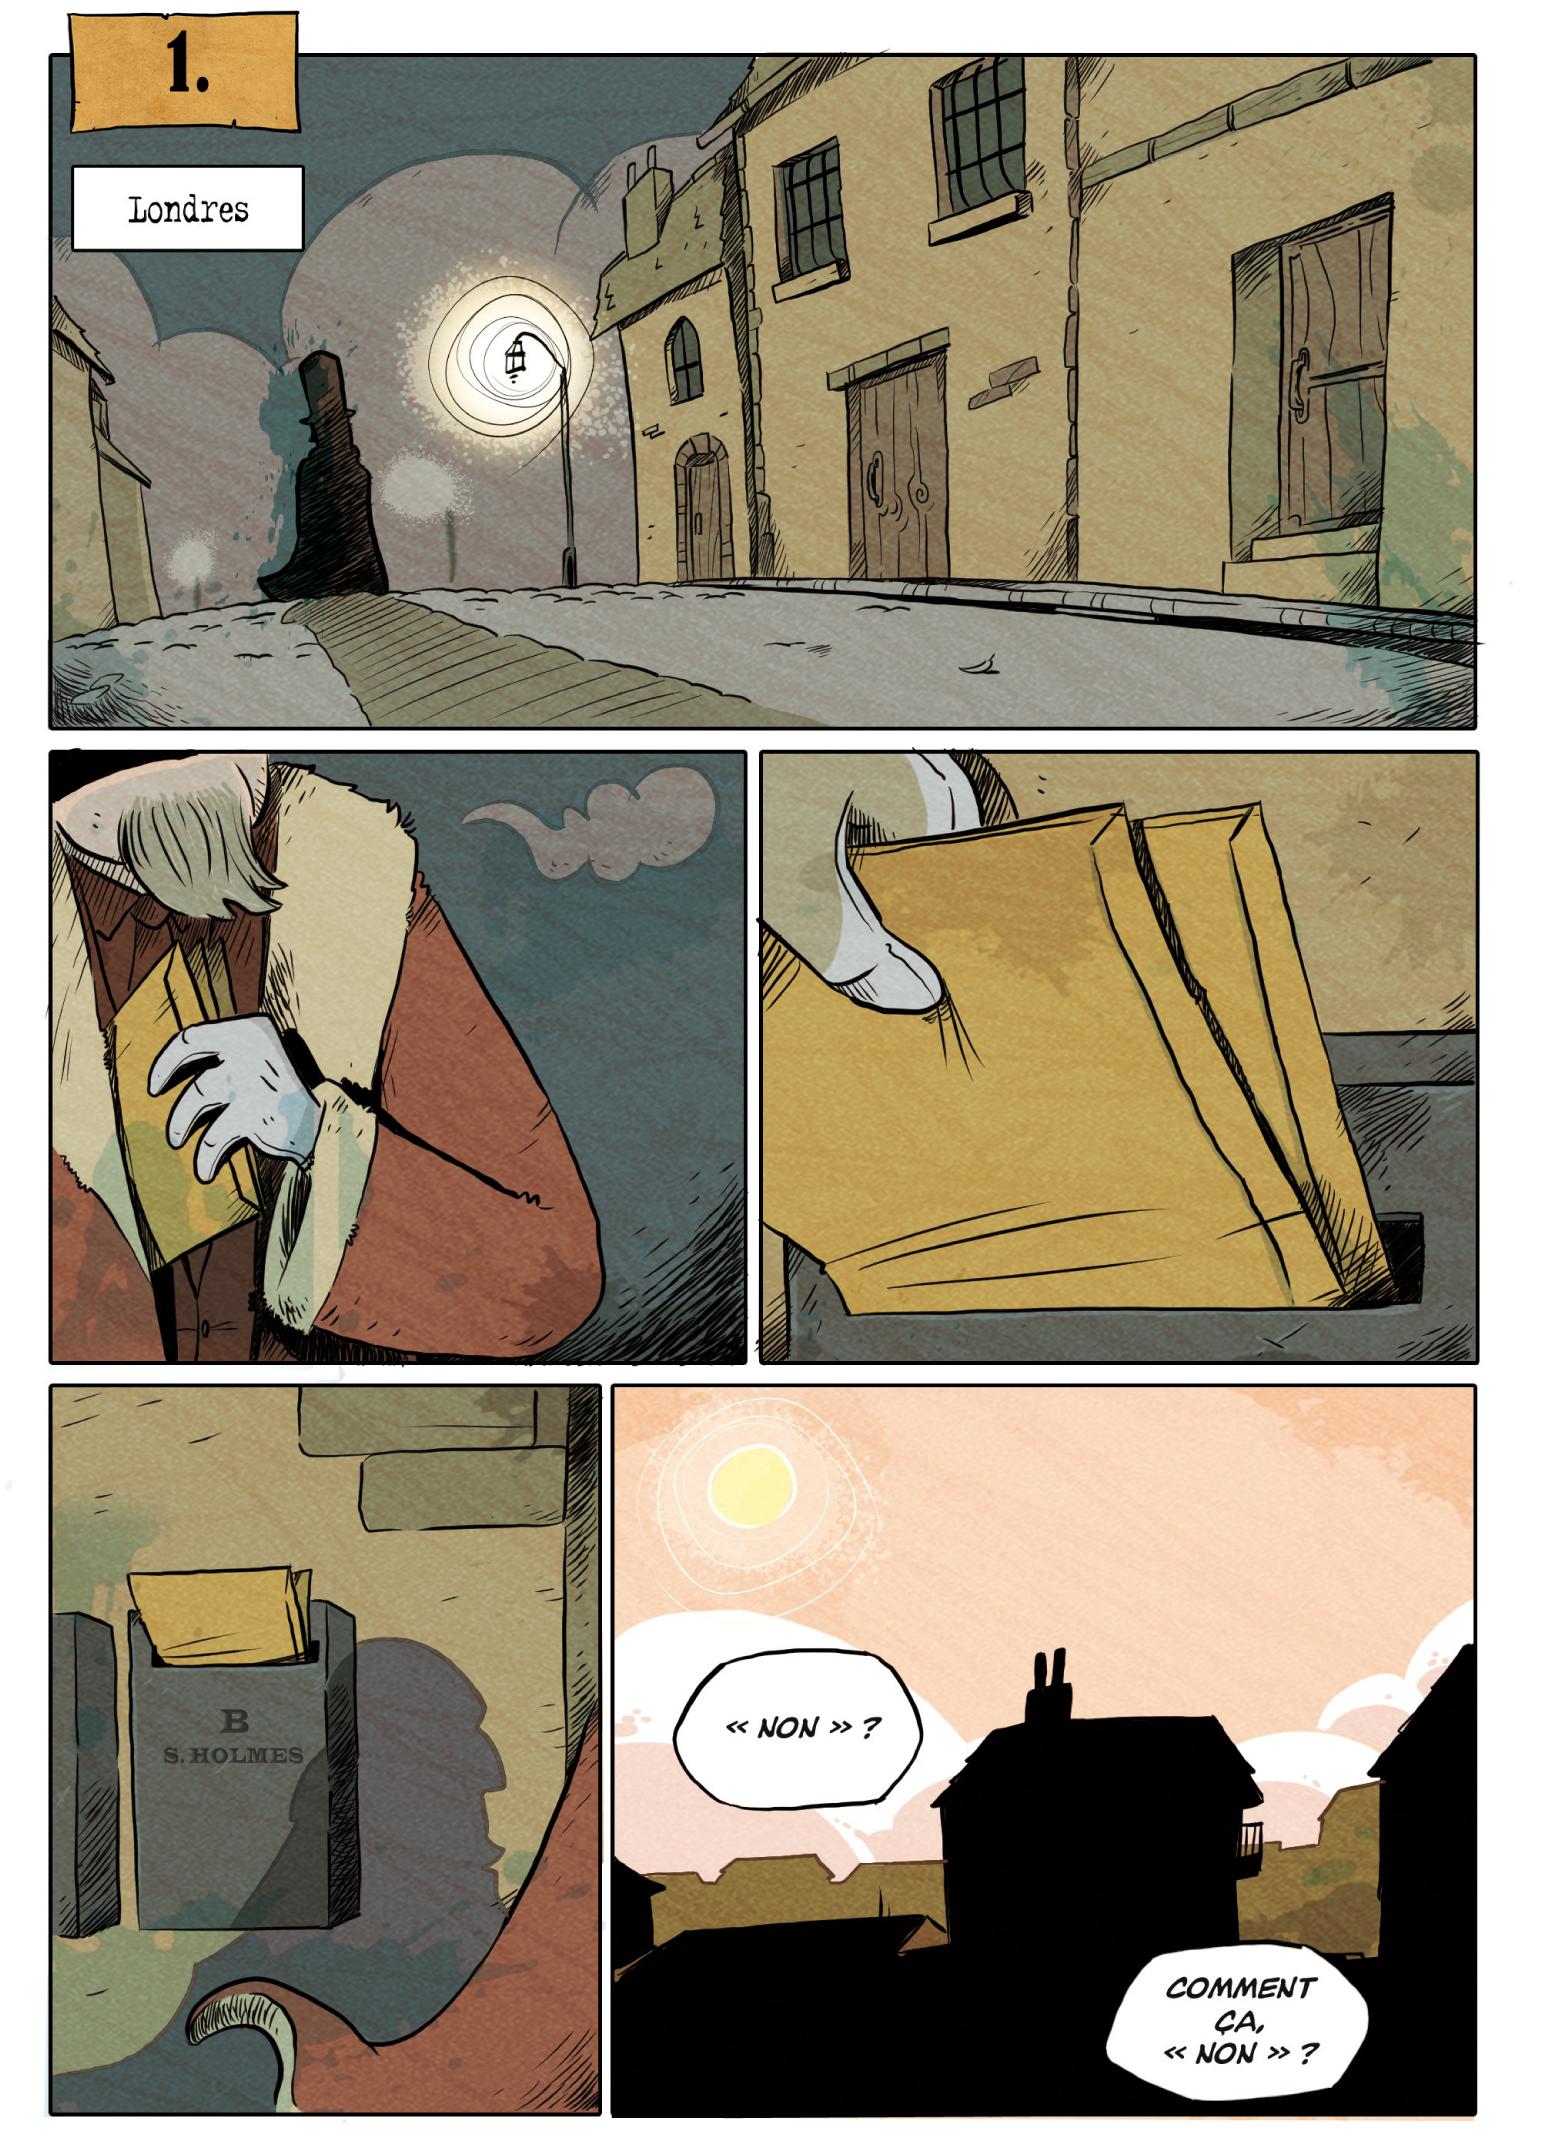 Sherlock_Holmes#2_P1